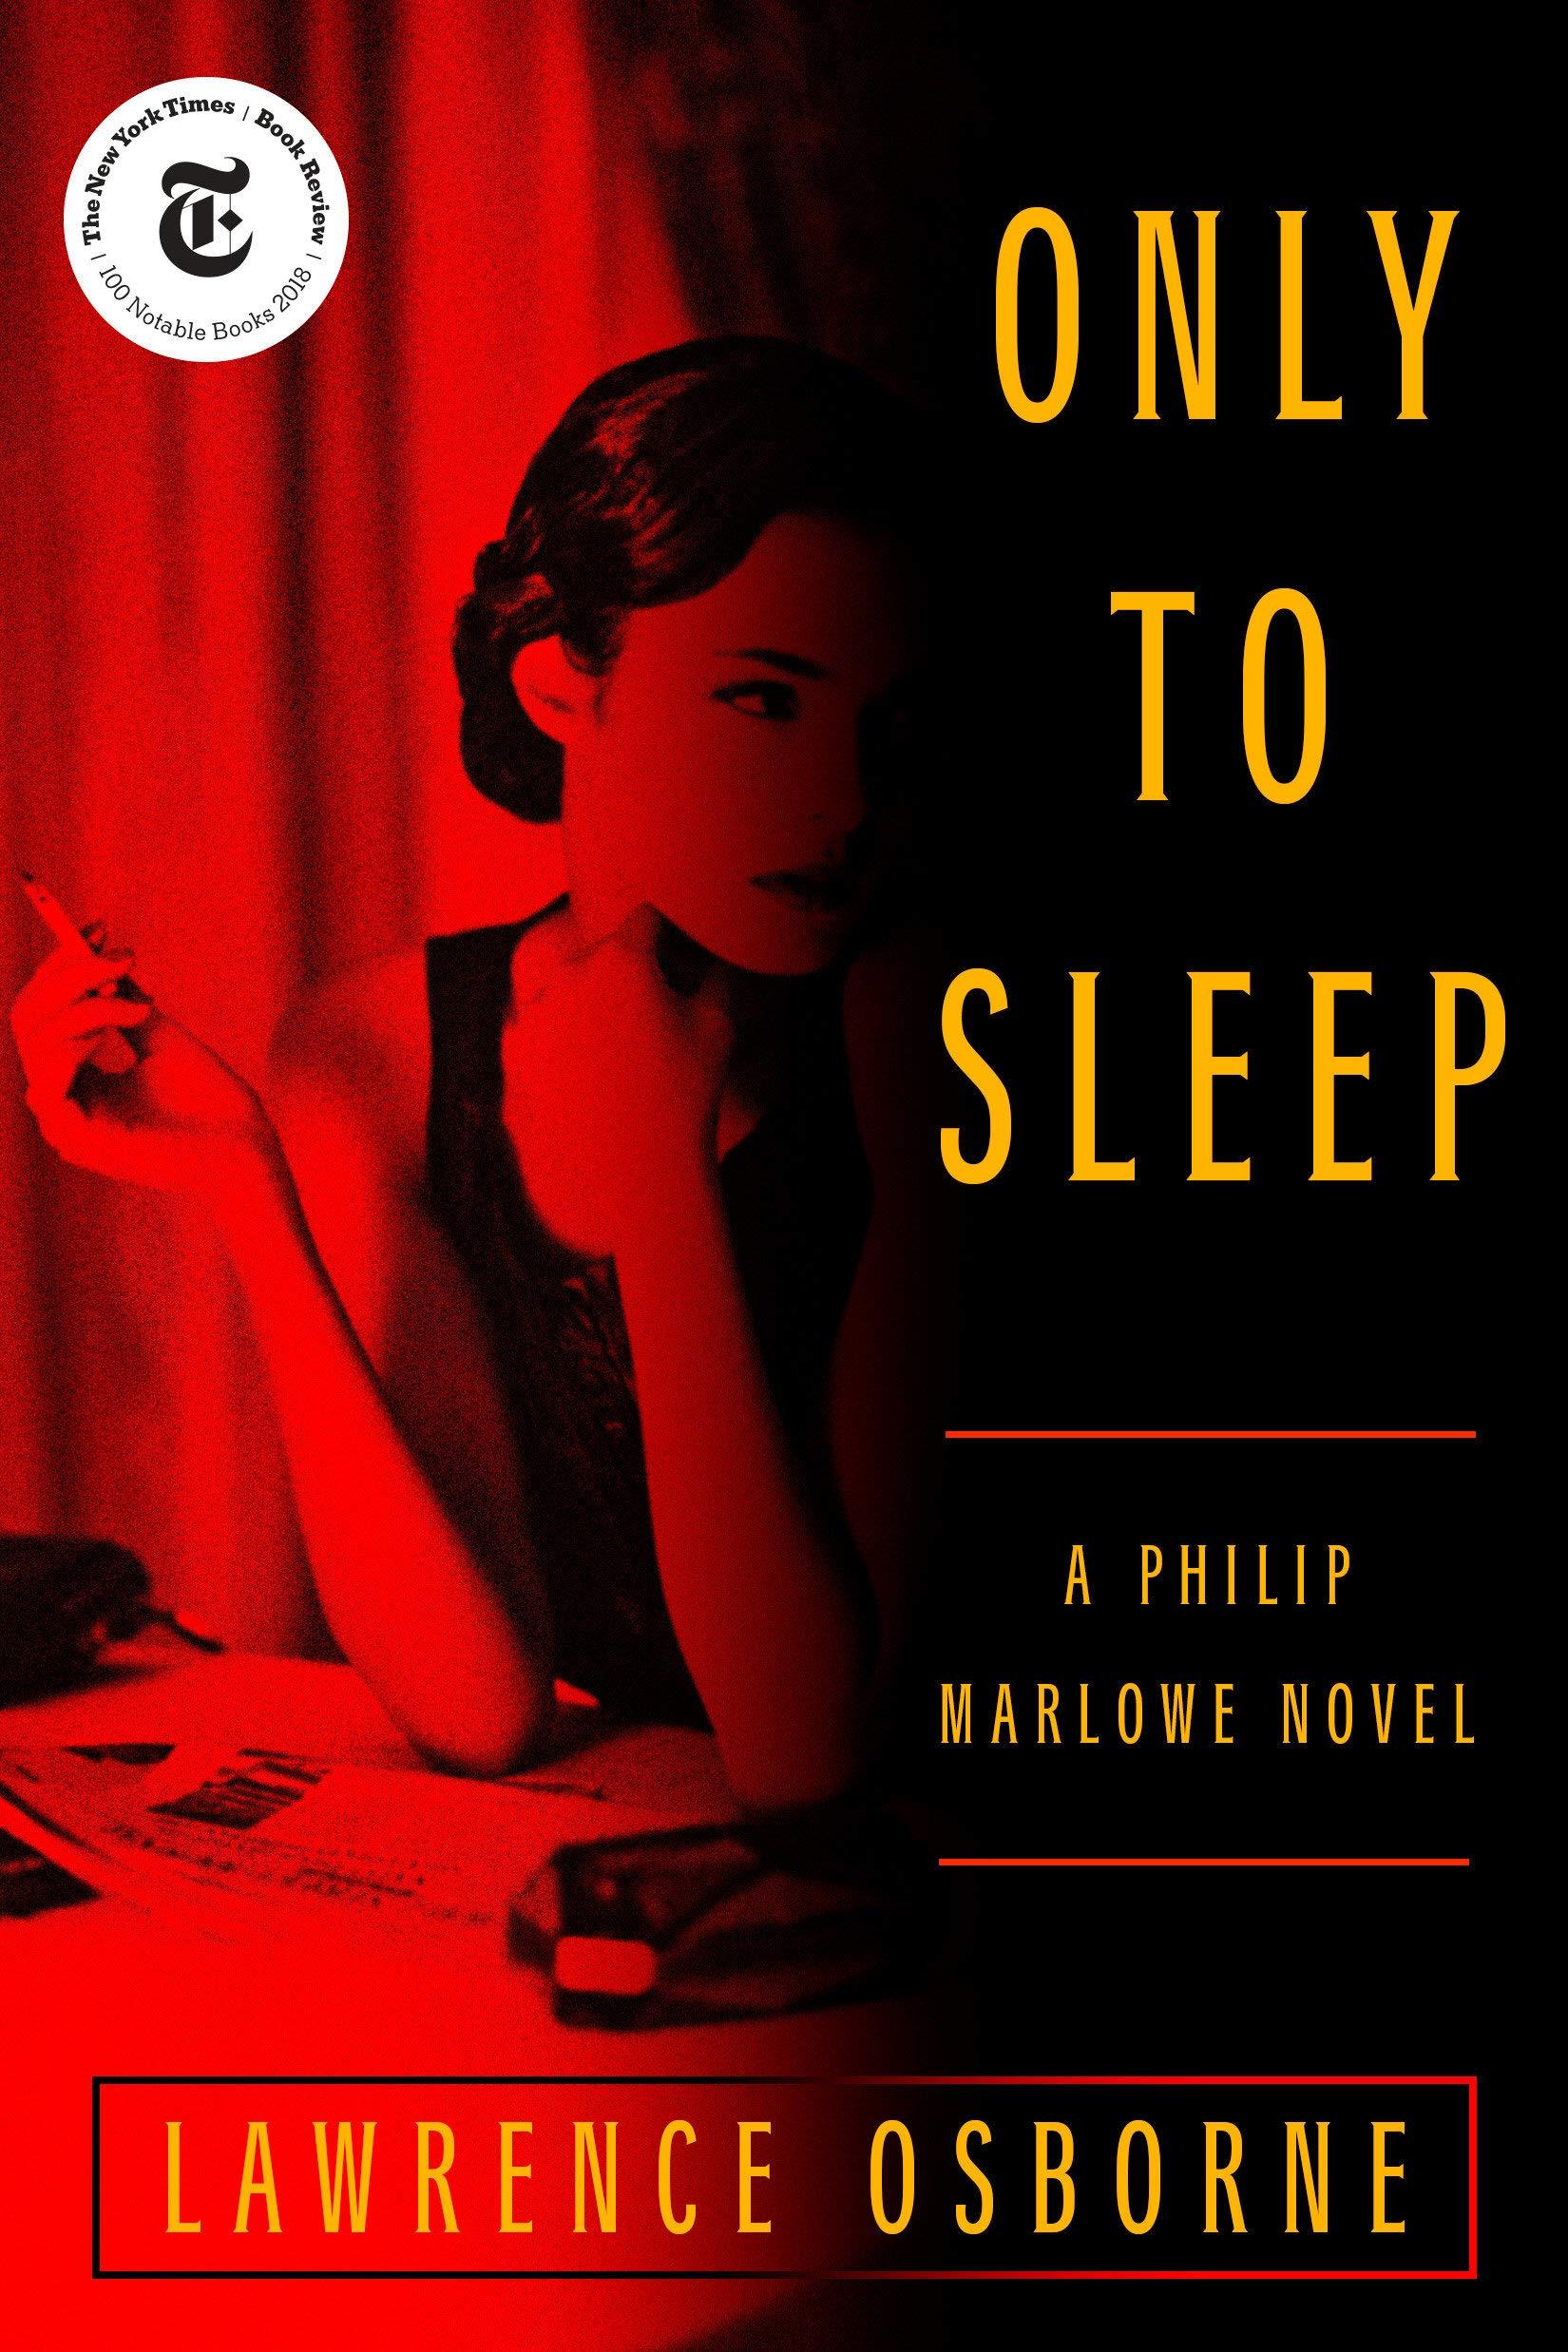 Only to Sleep: A Philip Marlowe Novel: Lawrence Osborne